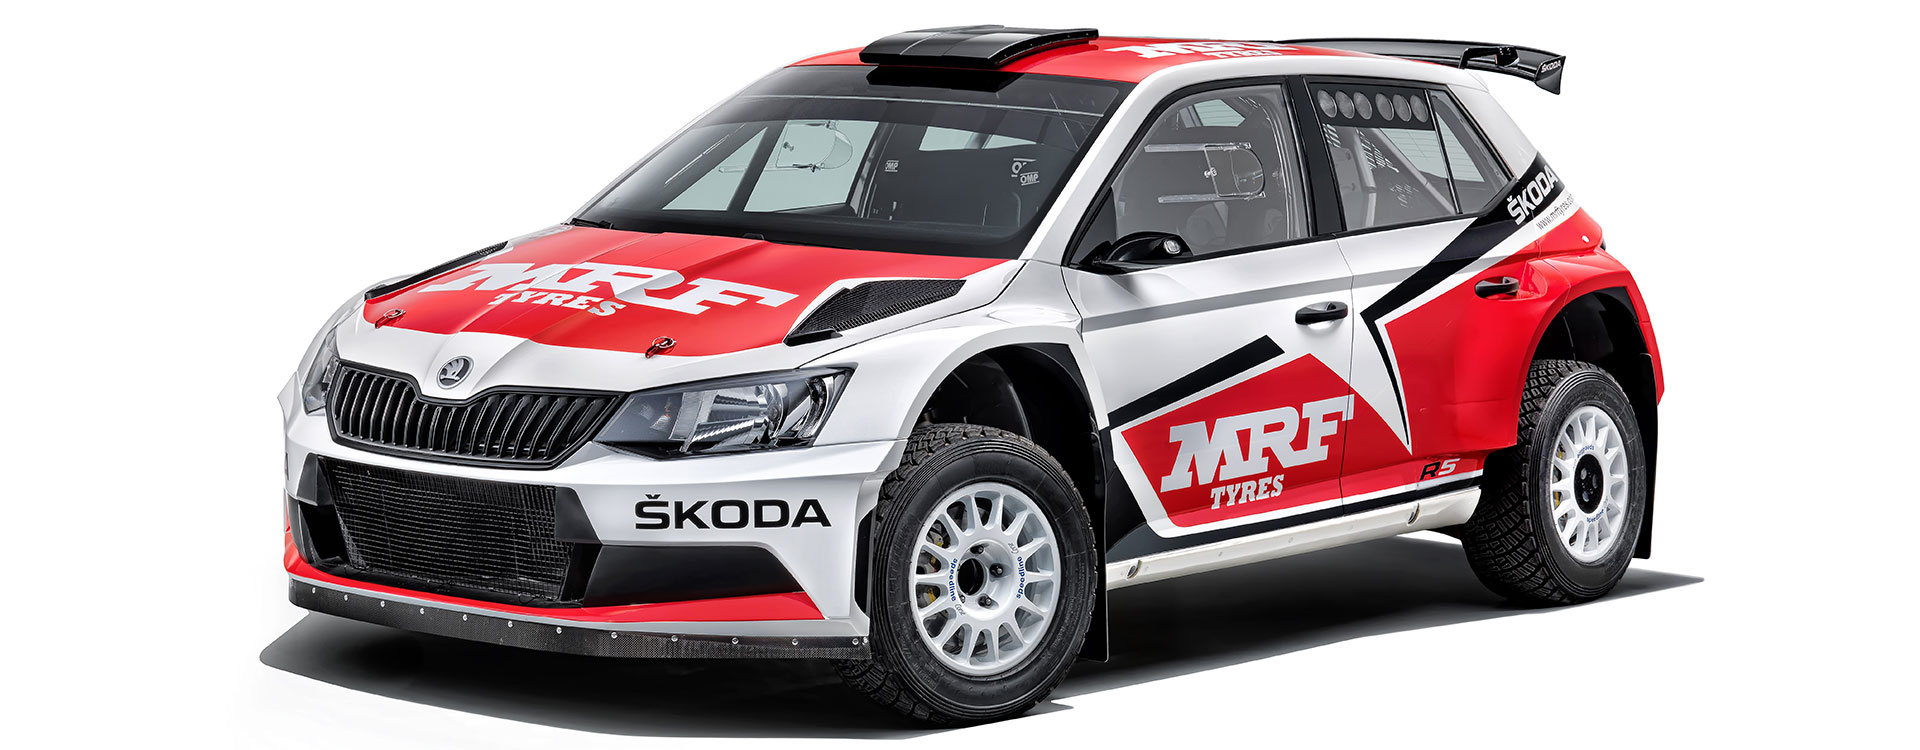 Asia-Pacific Rally Championship (APRC)